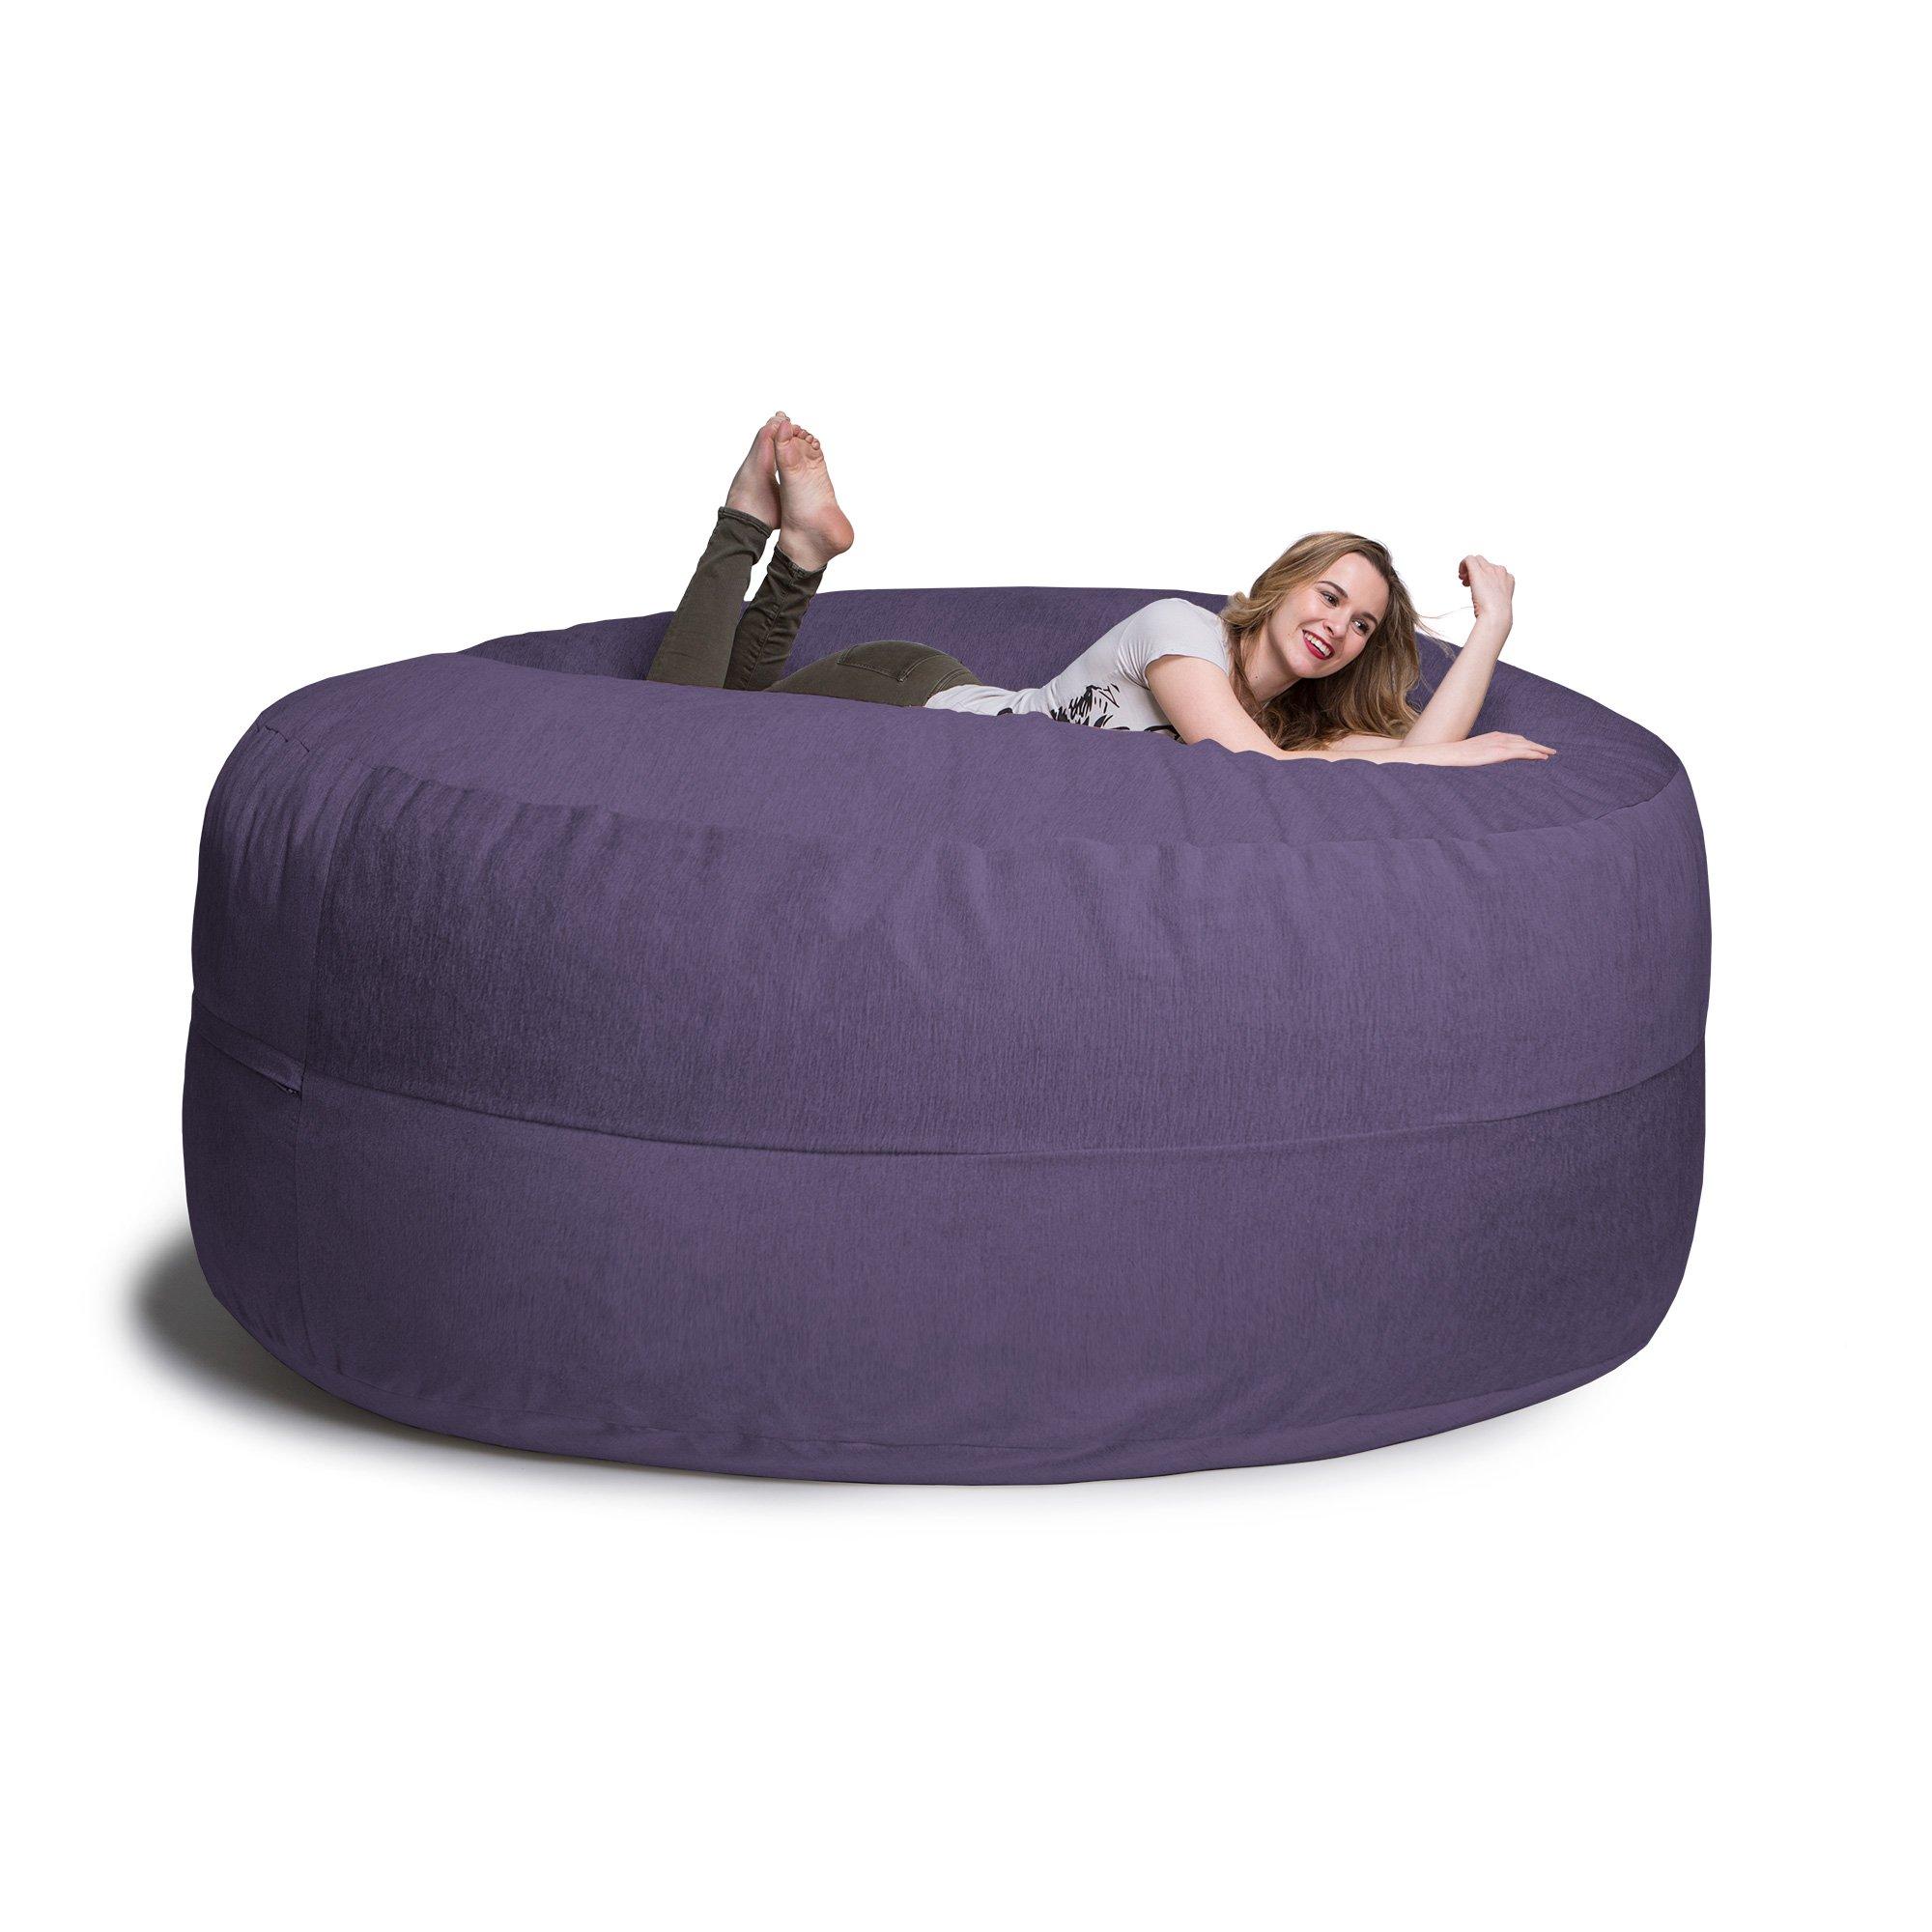 Jaxx Cocoon 8 Foot Huge Sleeper Bean Bag Bed - Chenille, Plum by Jaxx (Image #9)